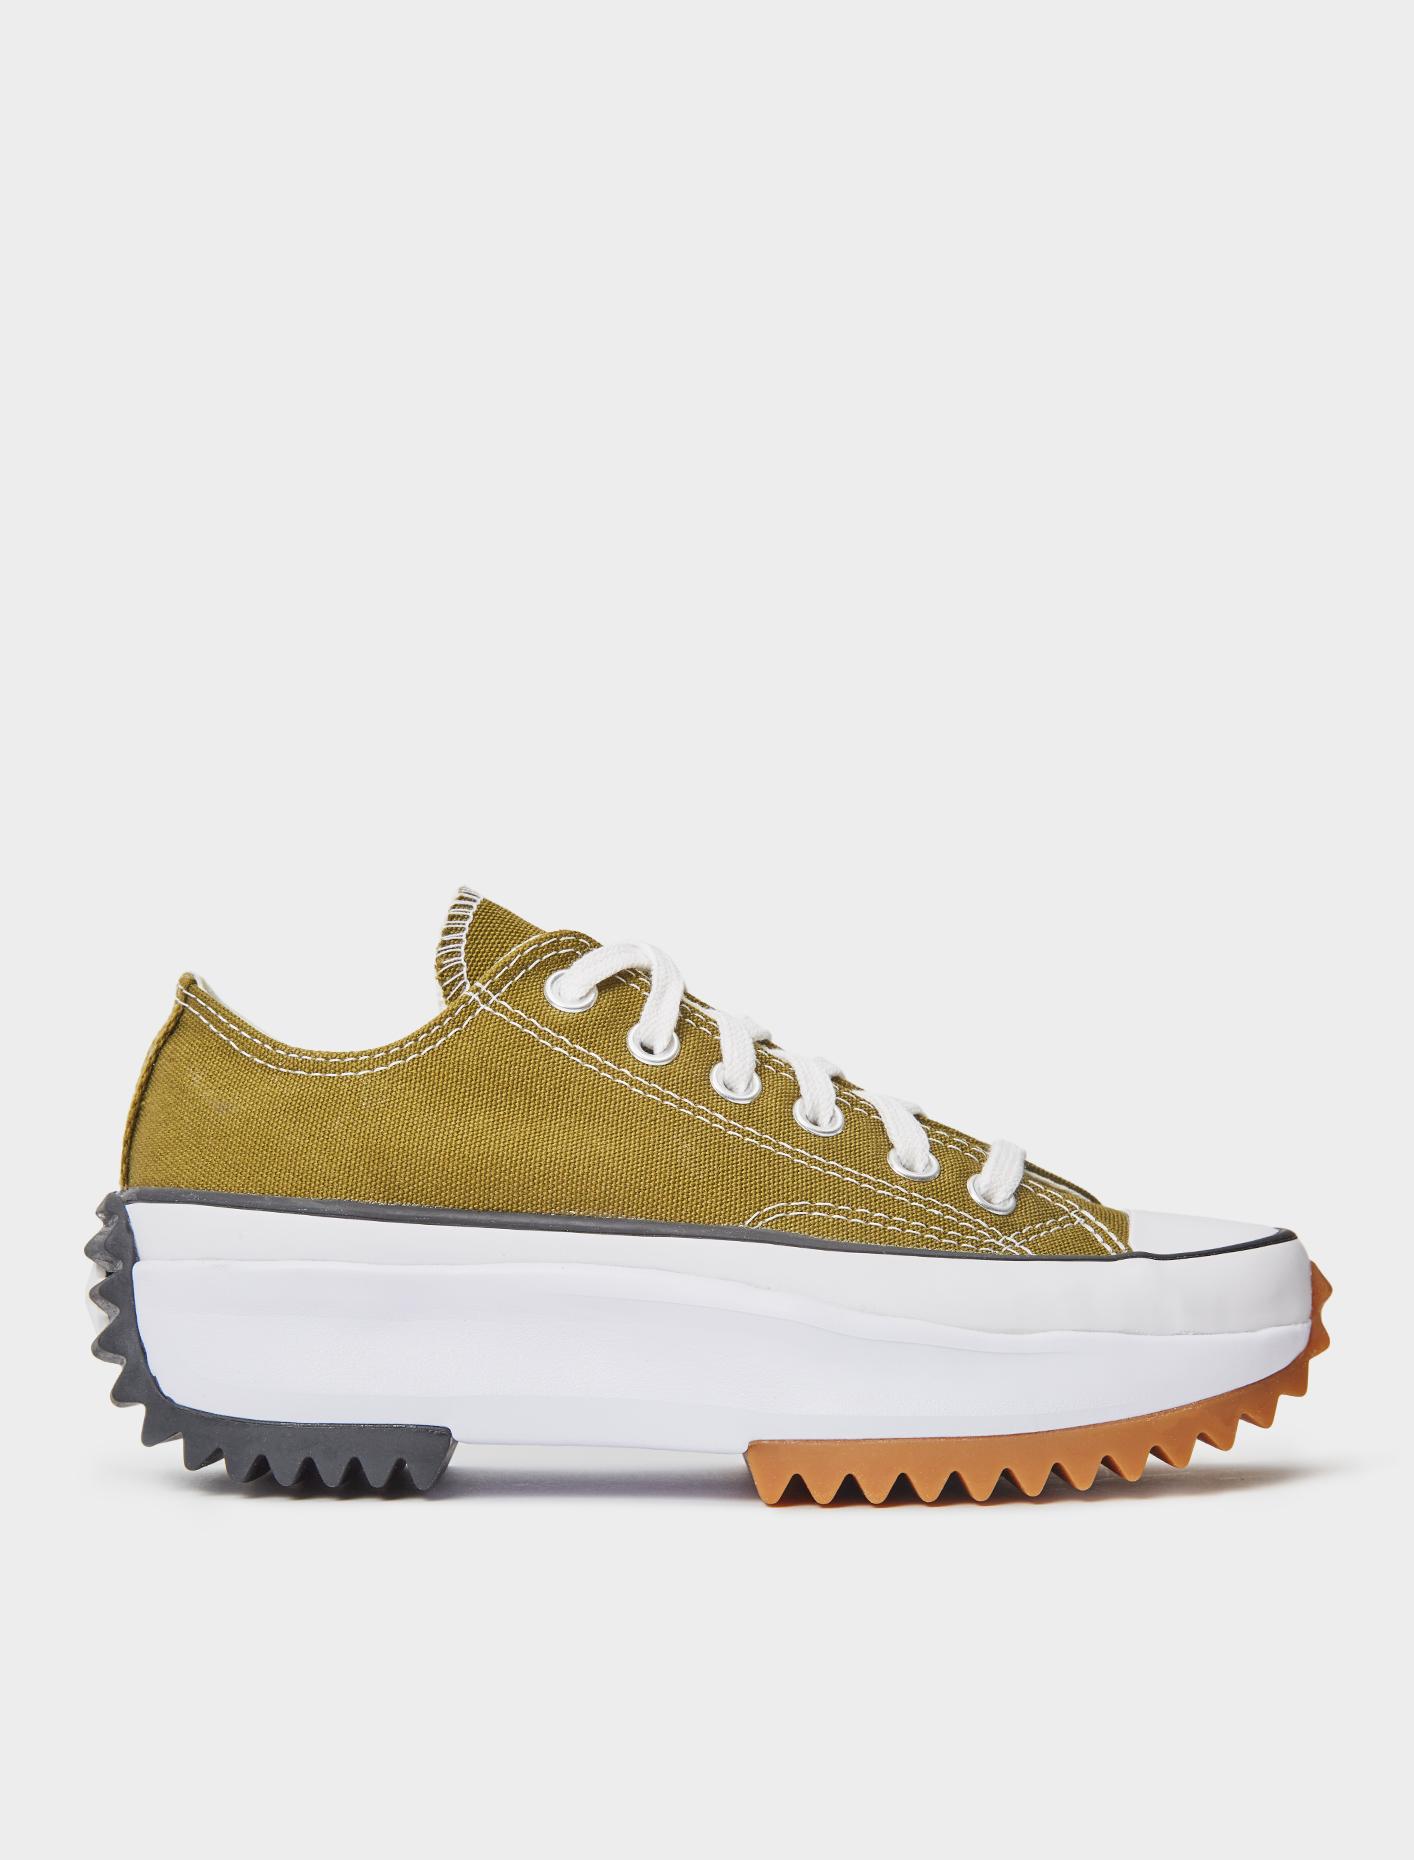 Converse Run Star Hike Low Sneaker in